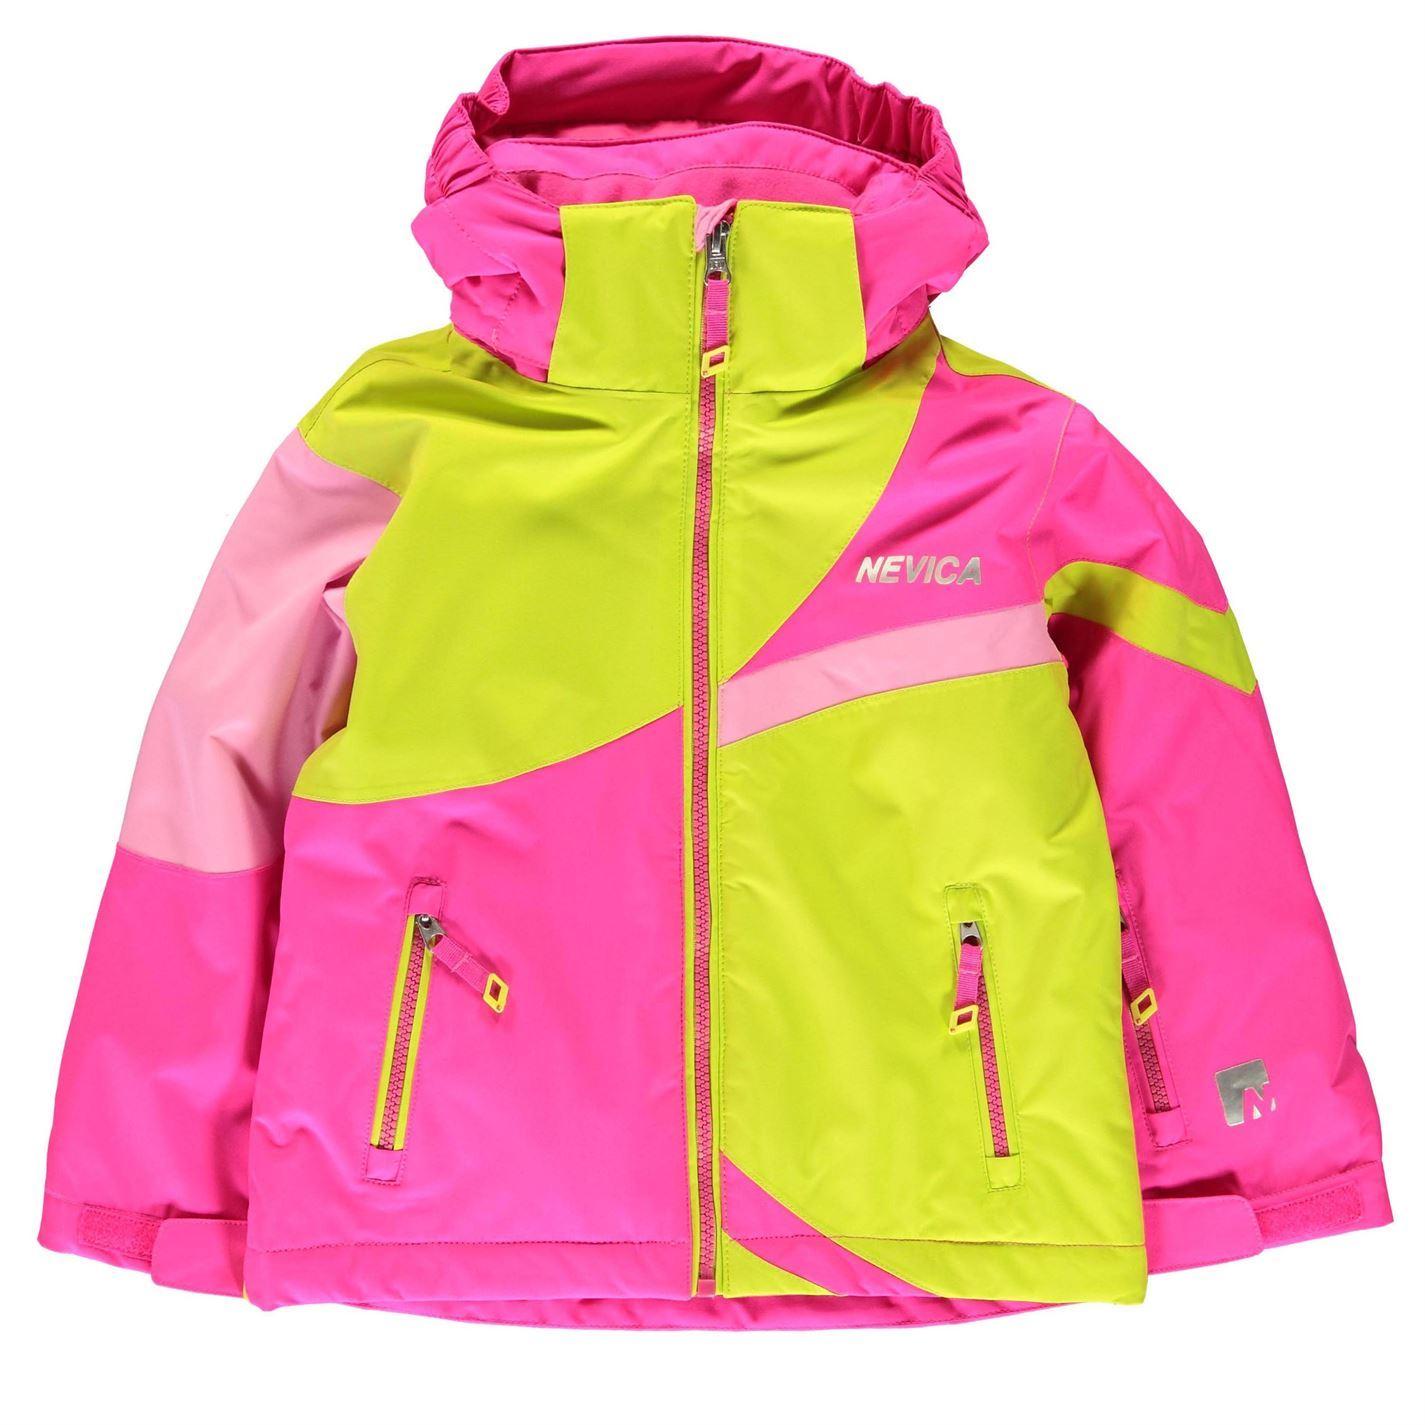 ... Nevica Meribel Jacket Infants Boys Snow Coat Skiing Outerwear f1fd5fe59f6